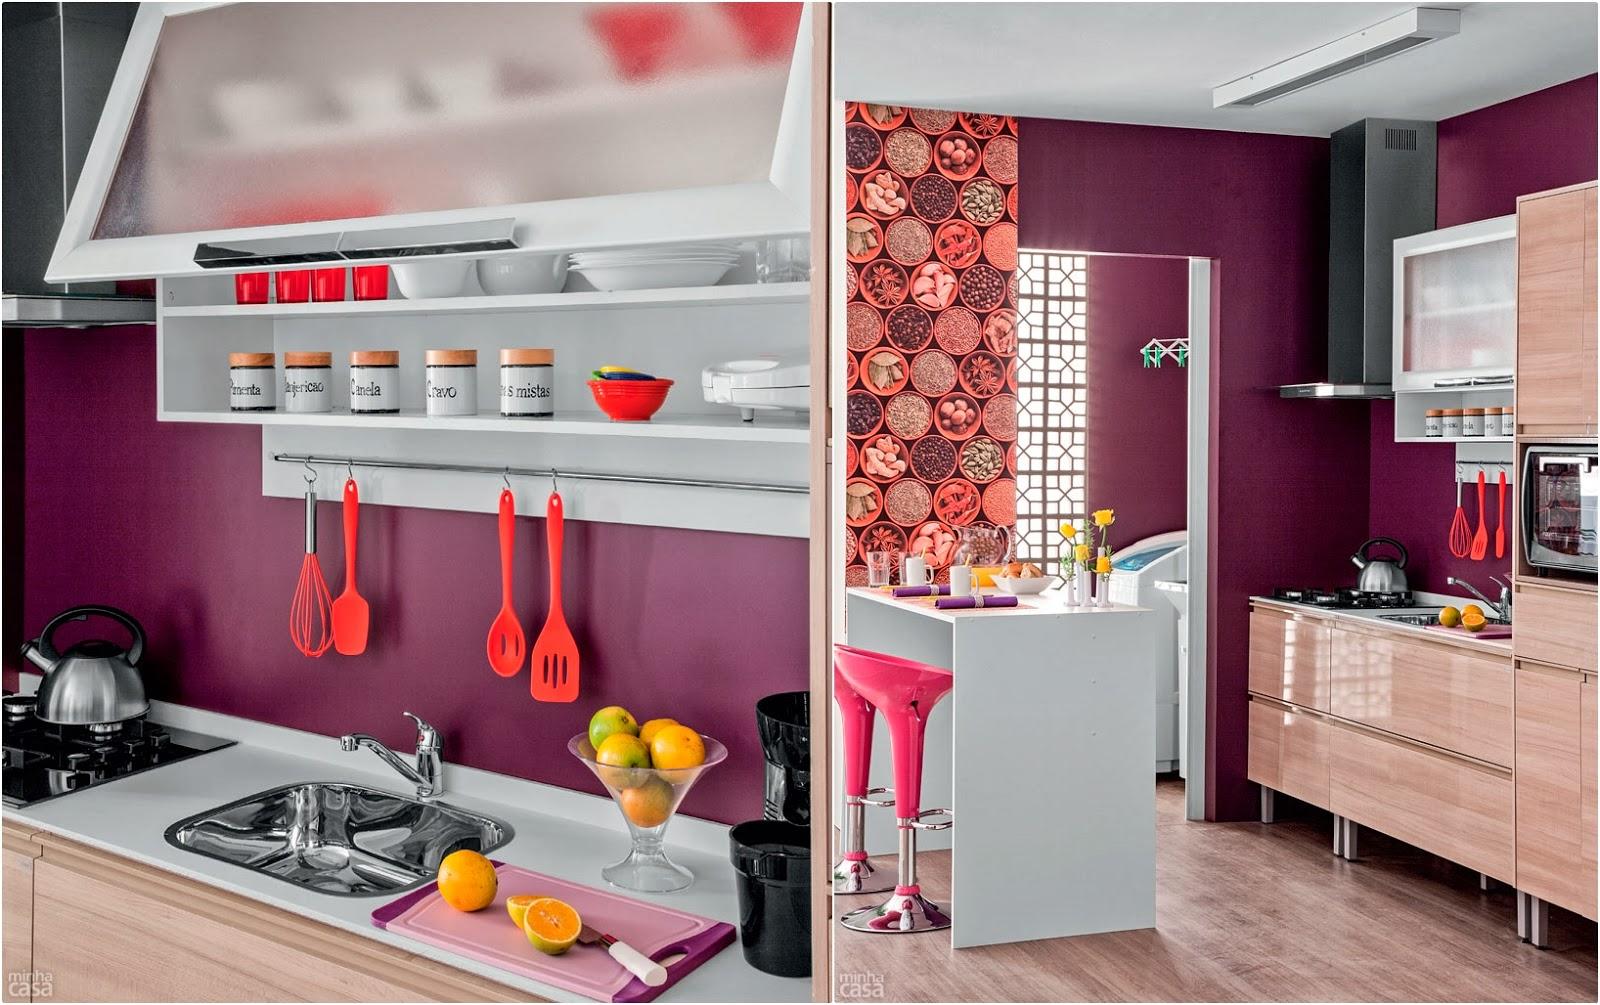 Cozinha americana divertida #AA2126 1600 1005